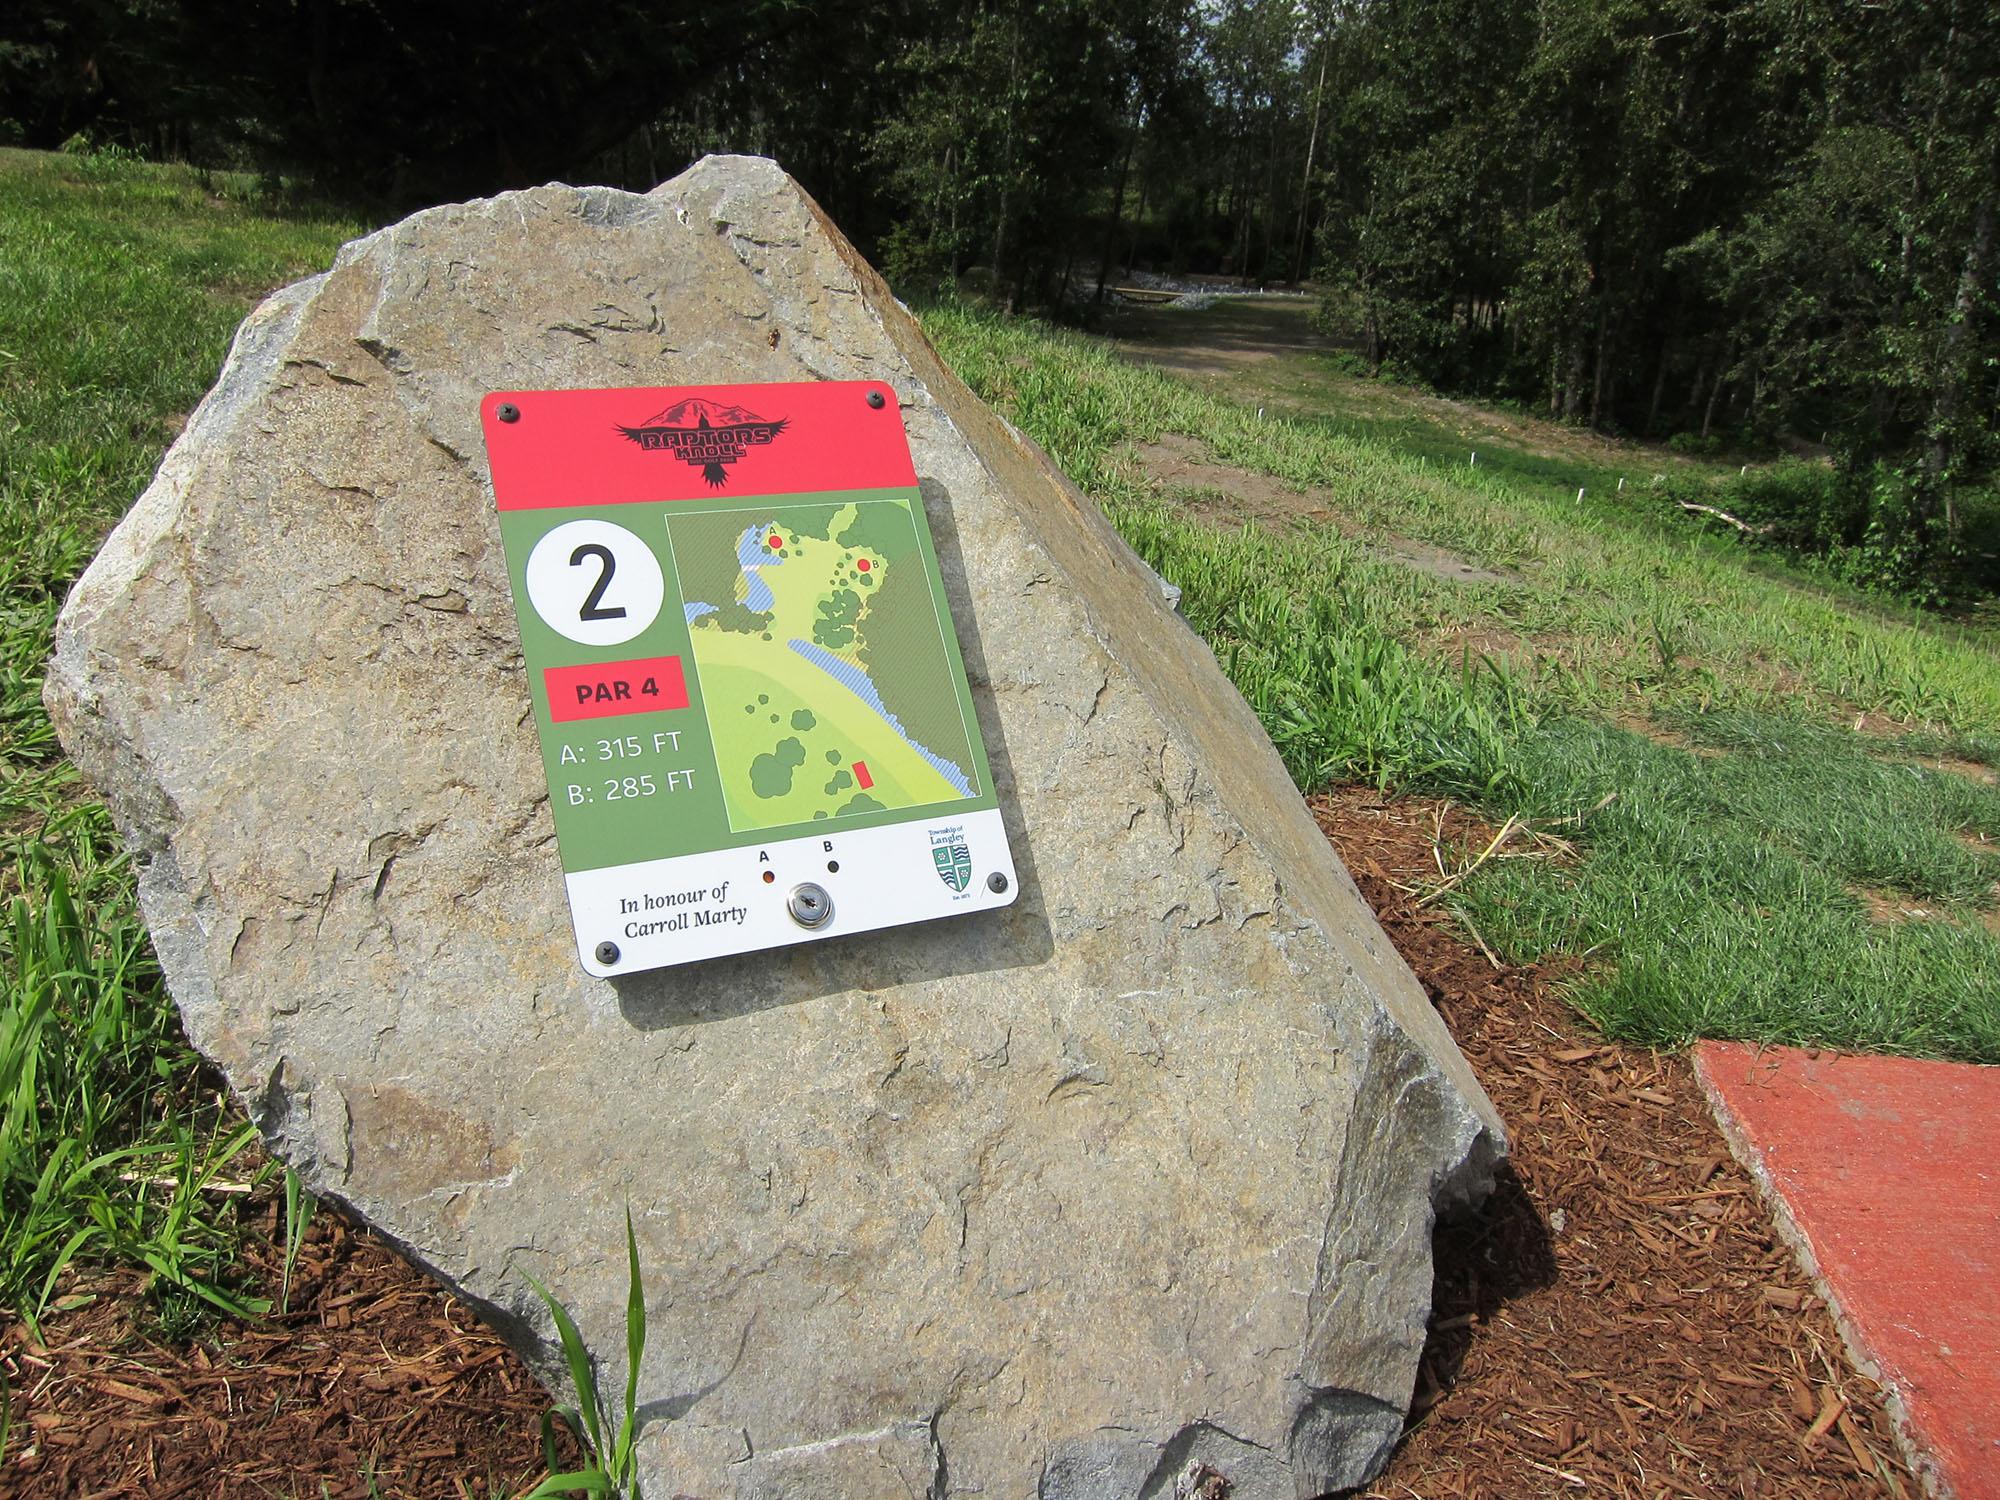 Tee sign at Raptors Knoll disc golf course, Aldergrove, BC.